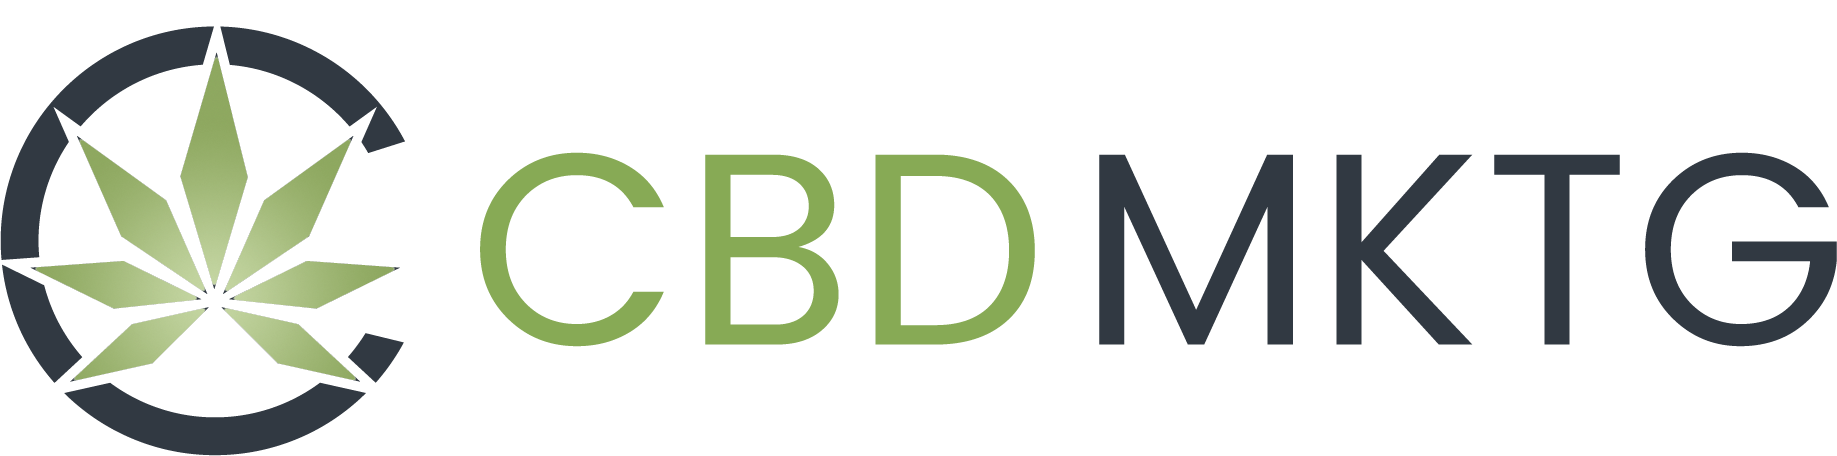 CBD Marketing